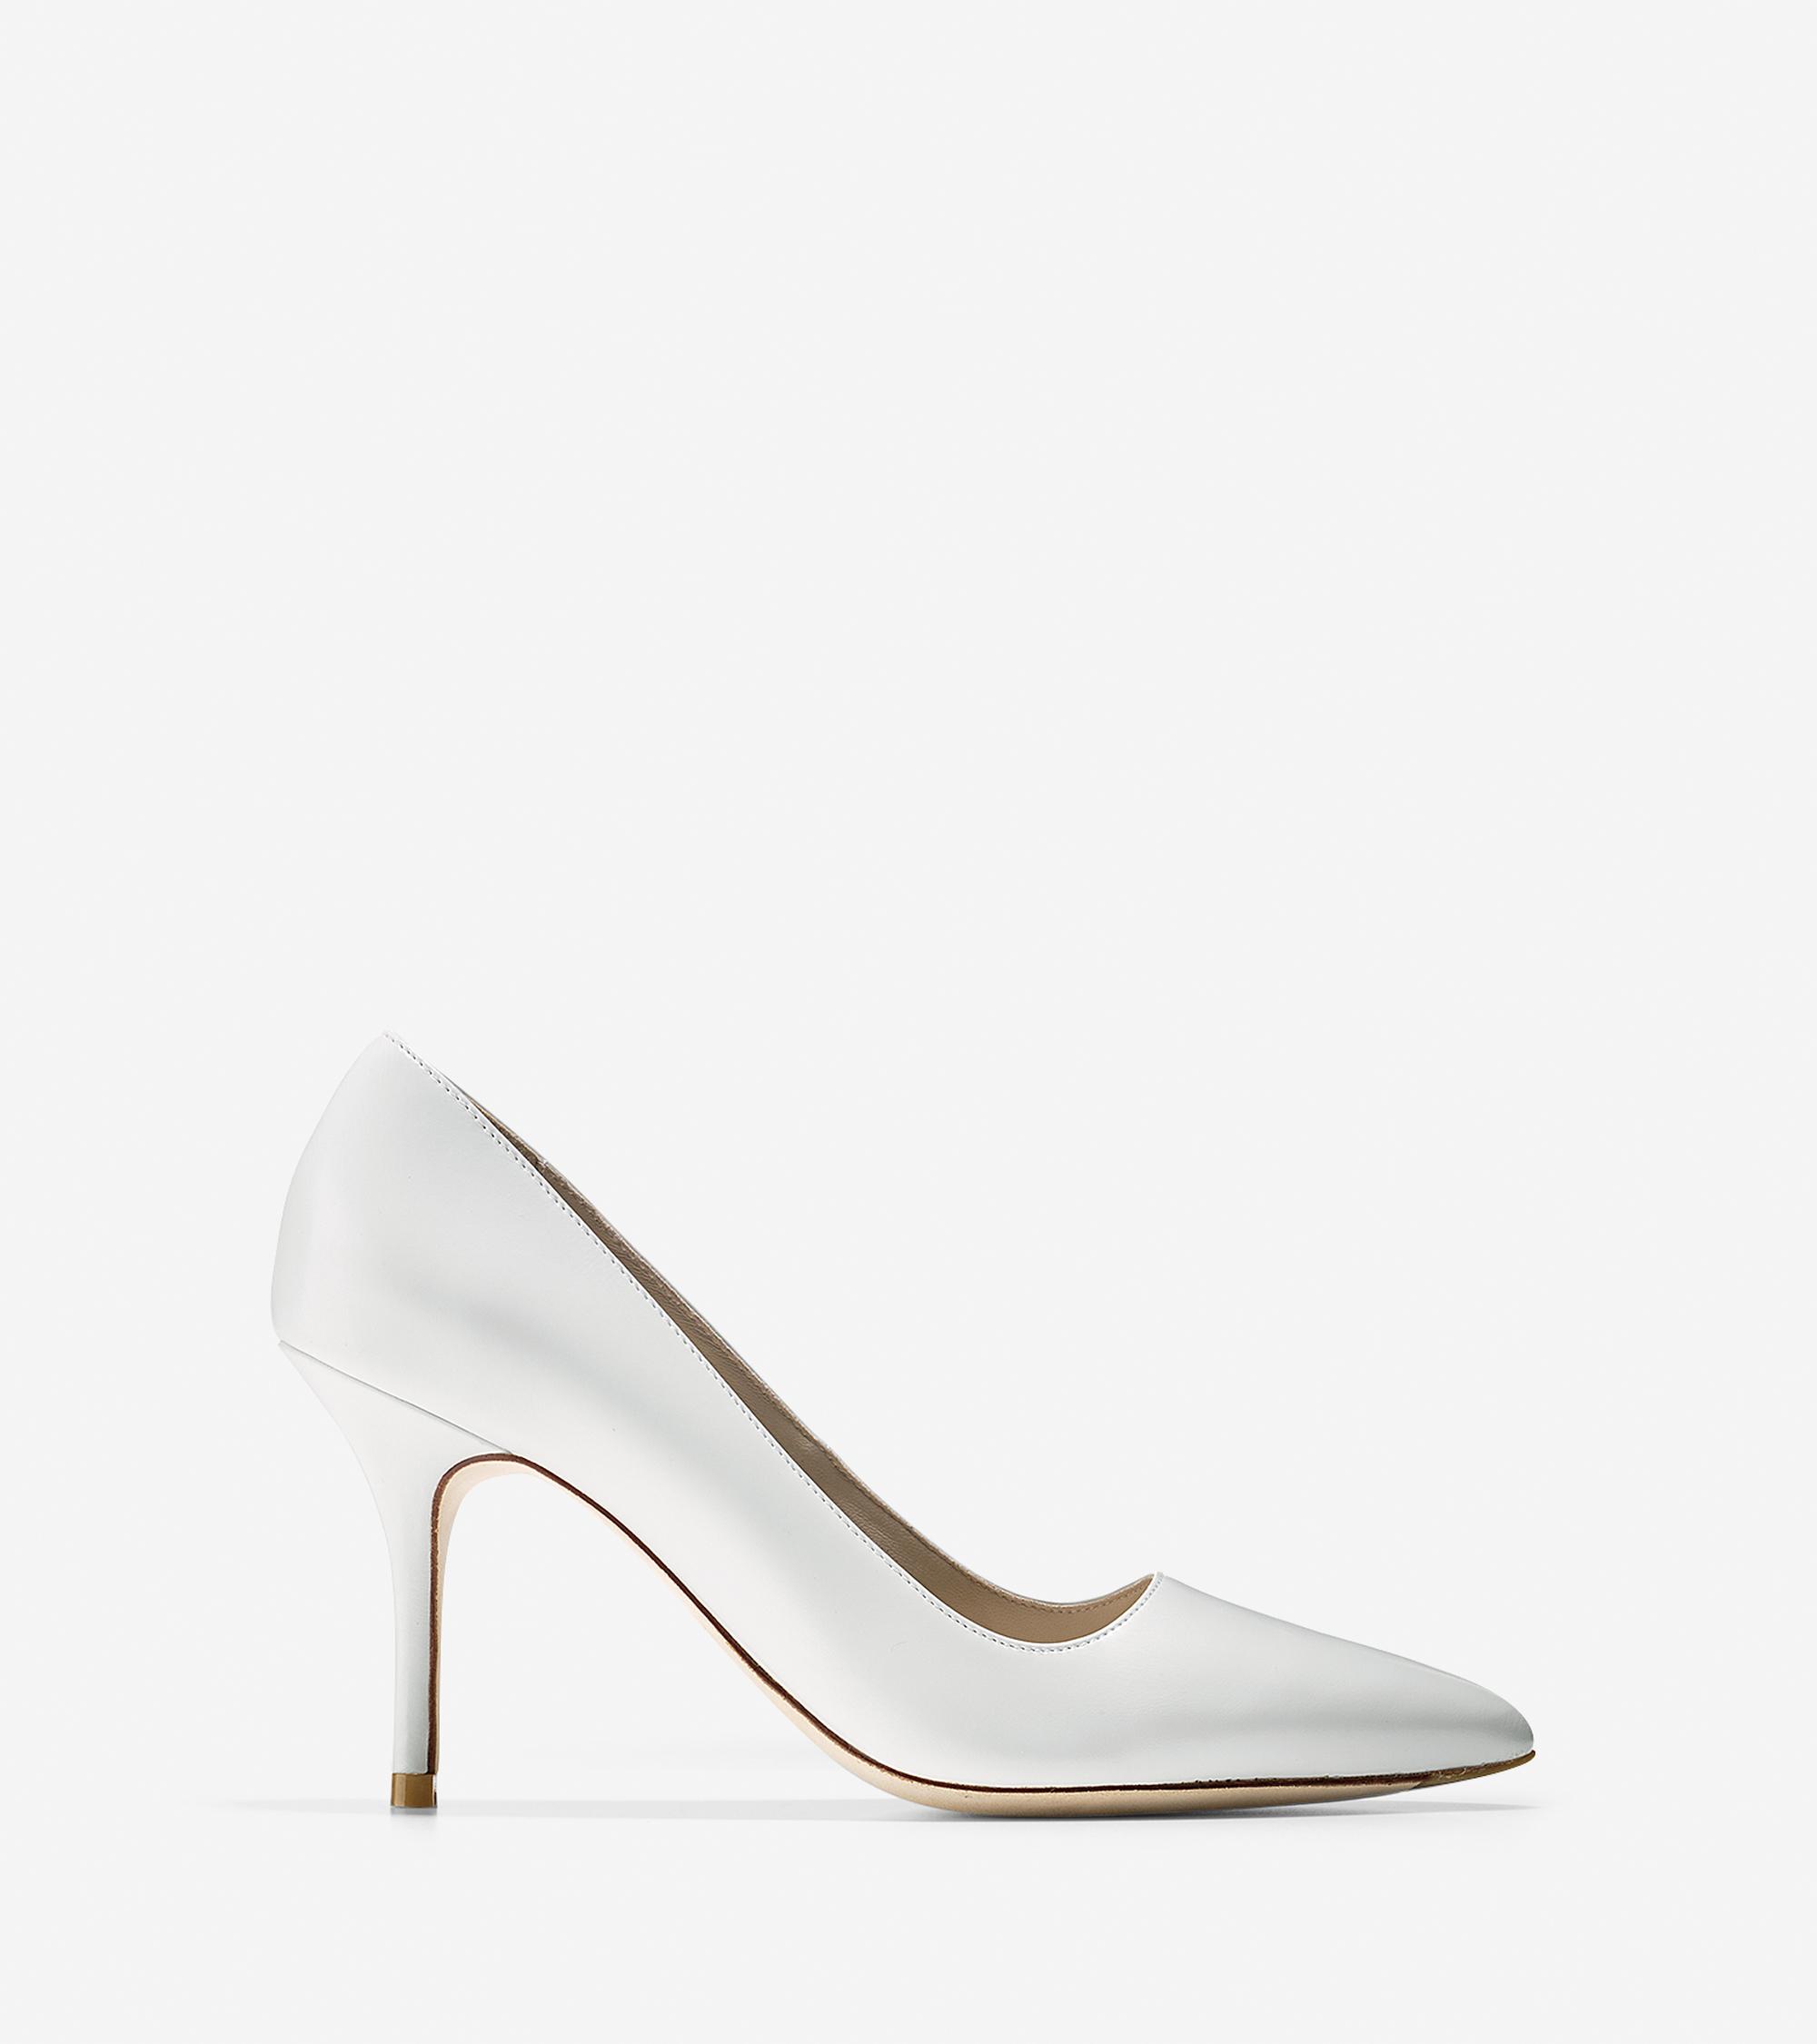 Womens Shoes Cole Haan Bradshaw Pump 85 Optic White